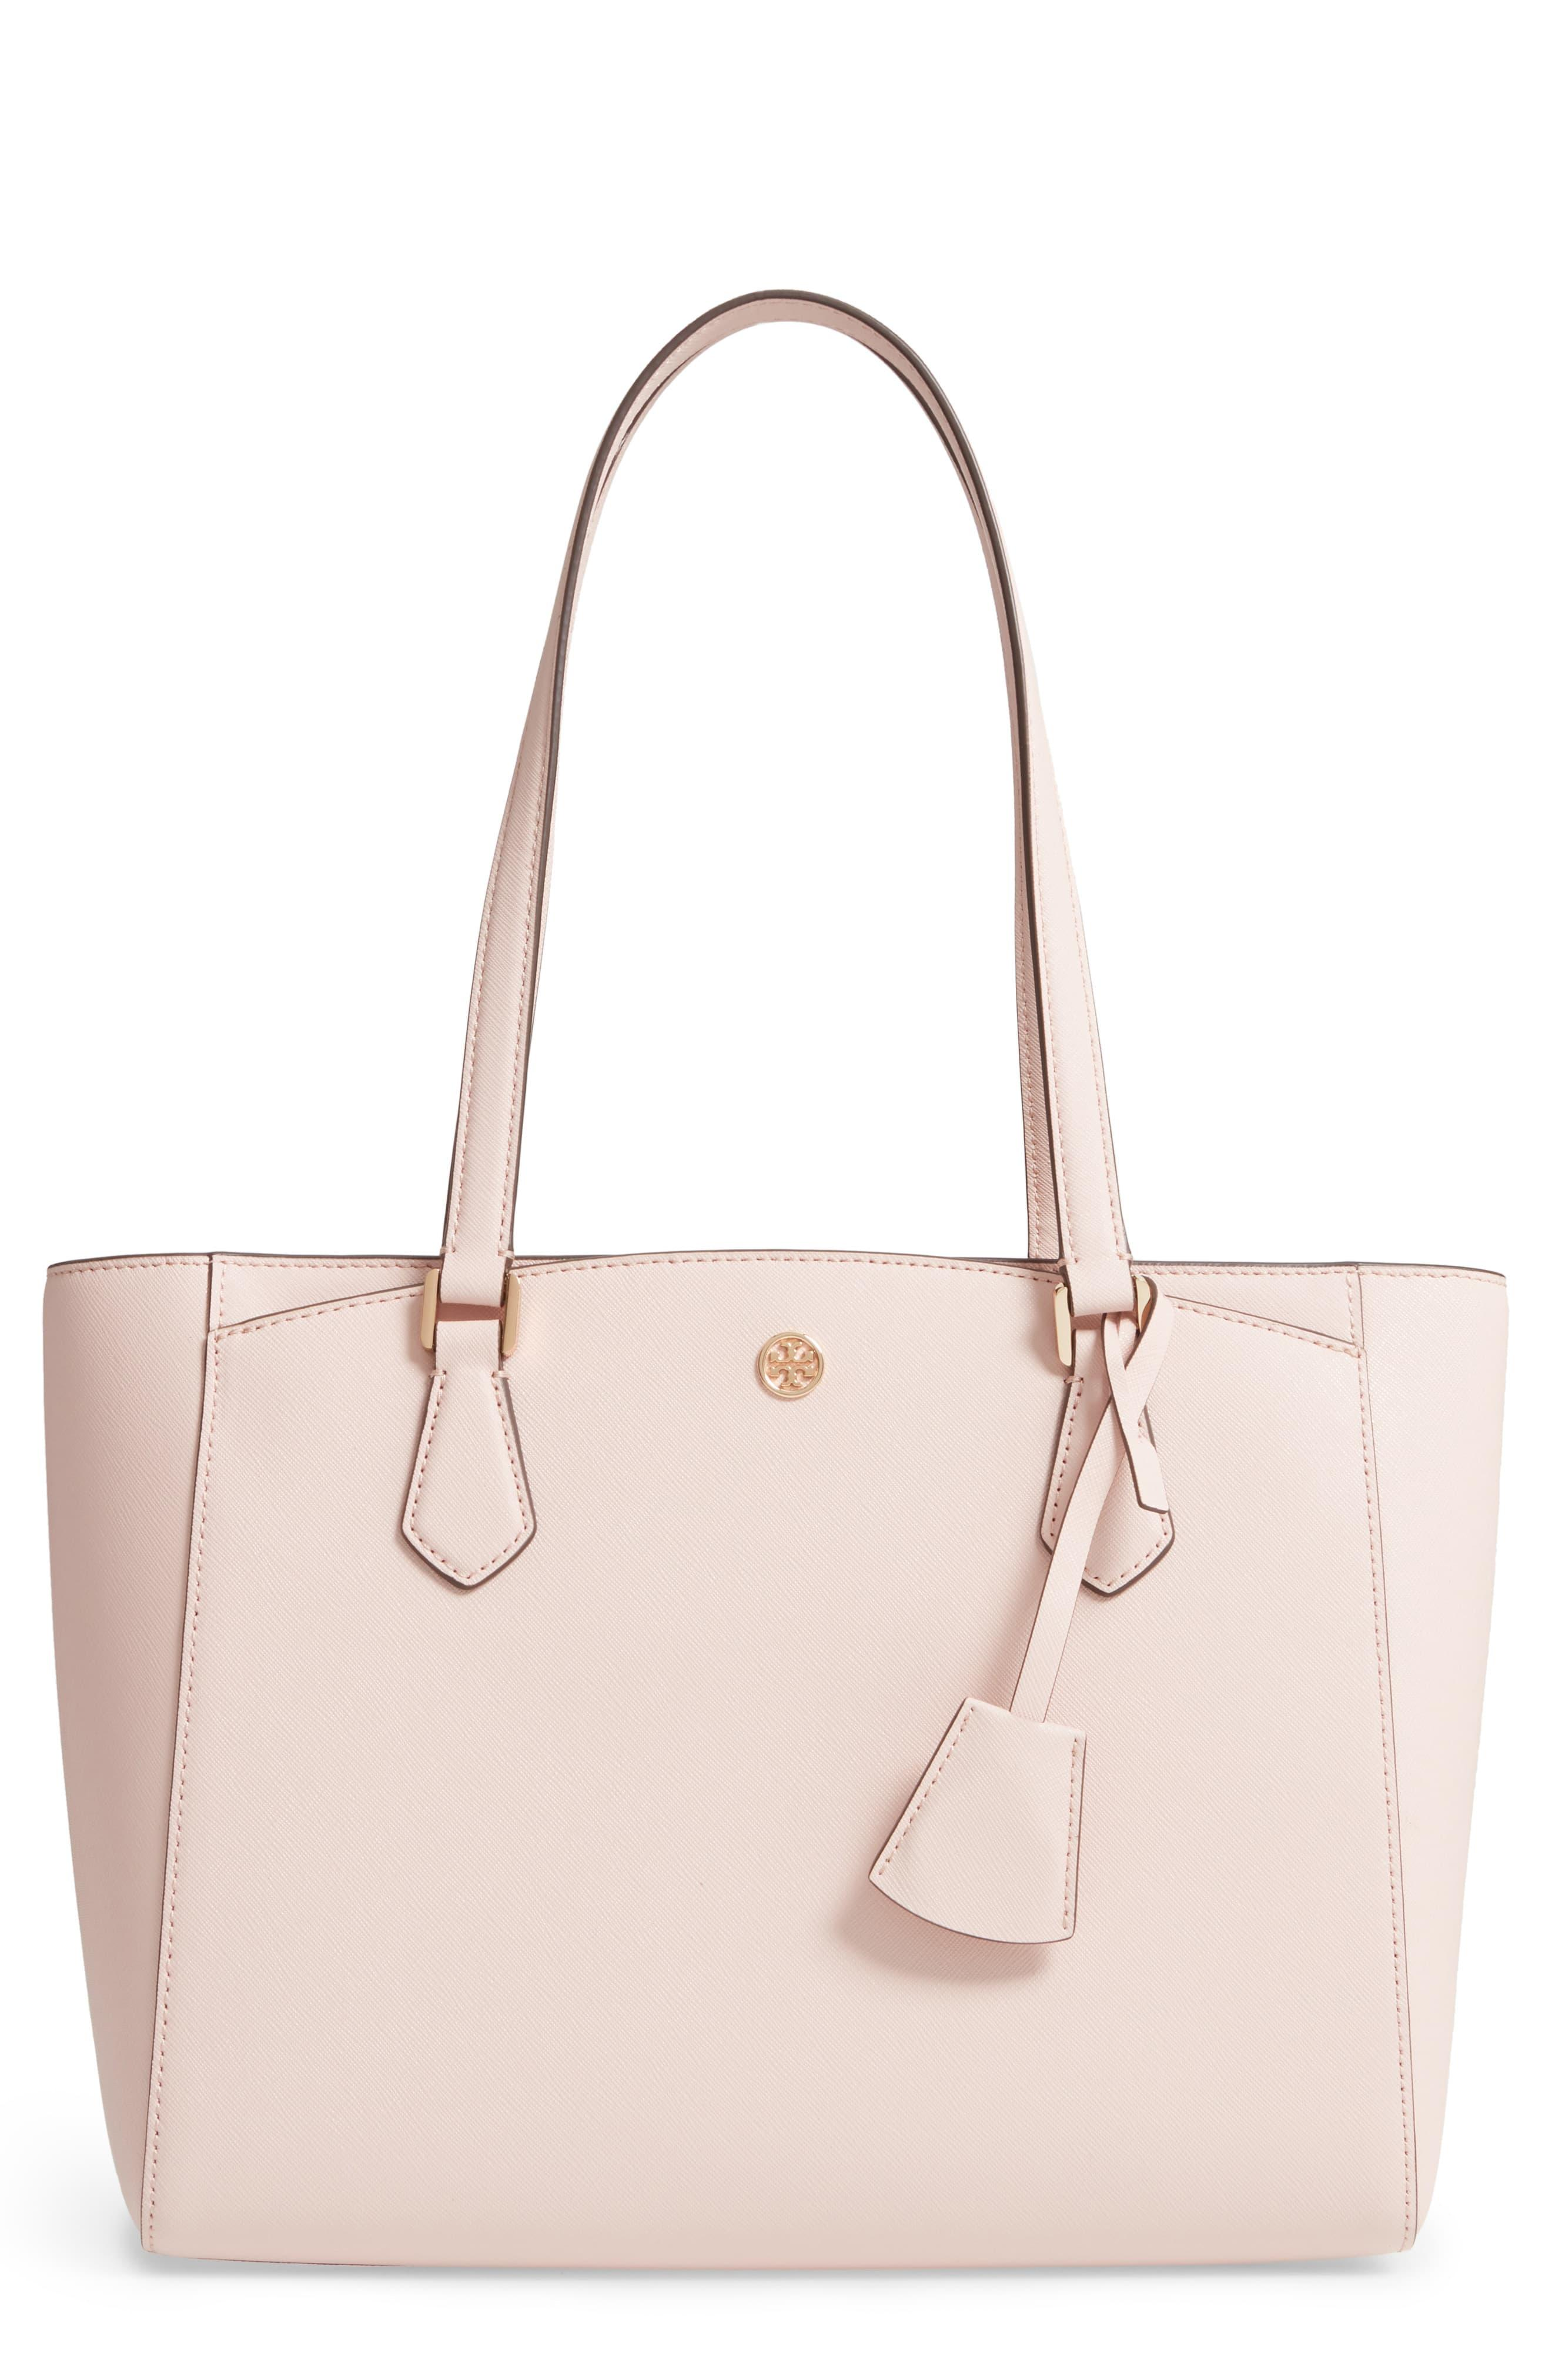 1b47df45a Tory Burch - Pink Robinson Small Saffiano Tote Bag - Lyst. View fullscreen